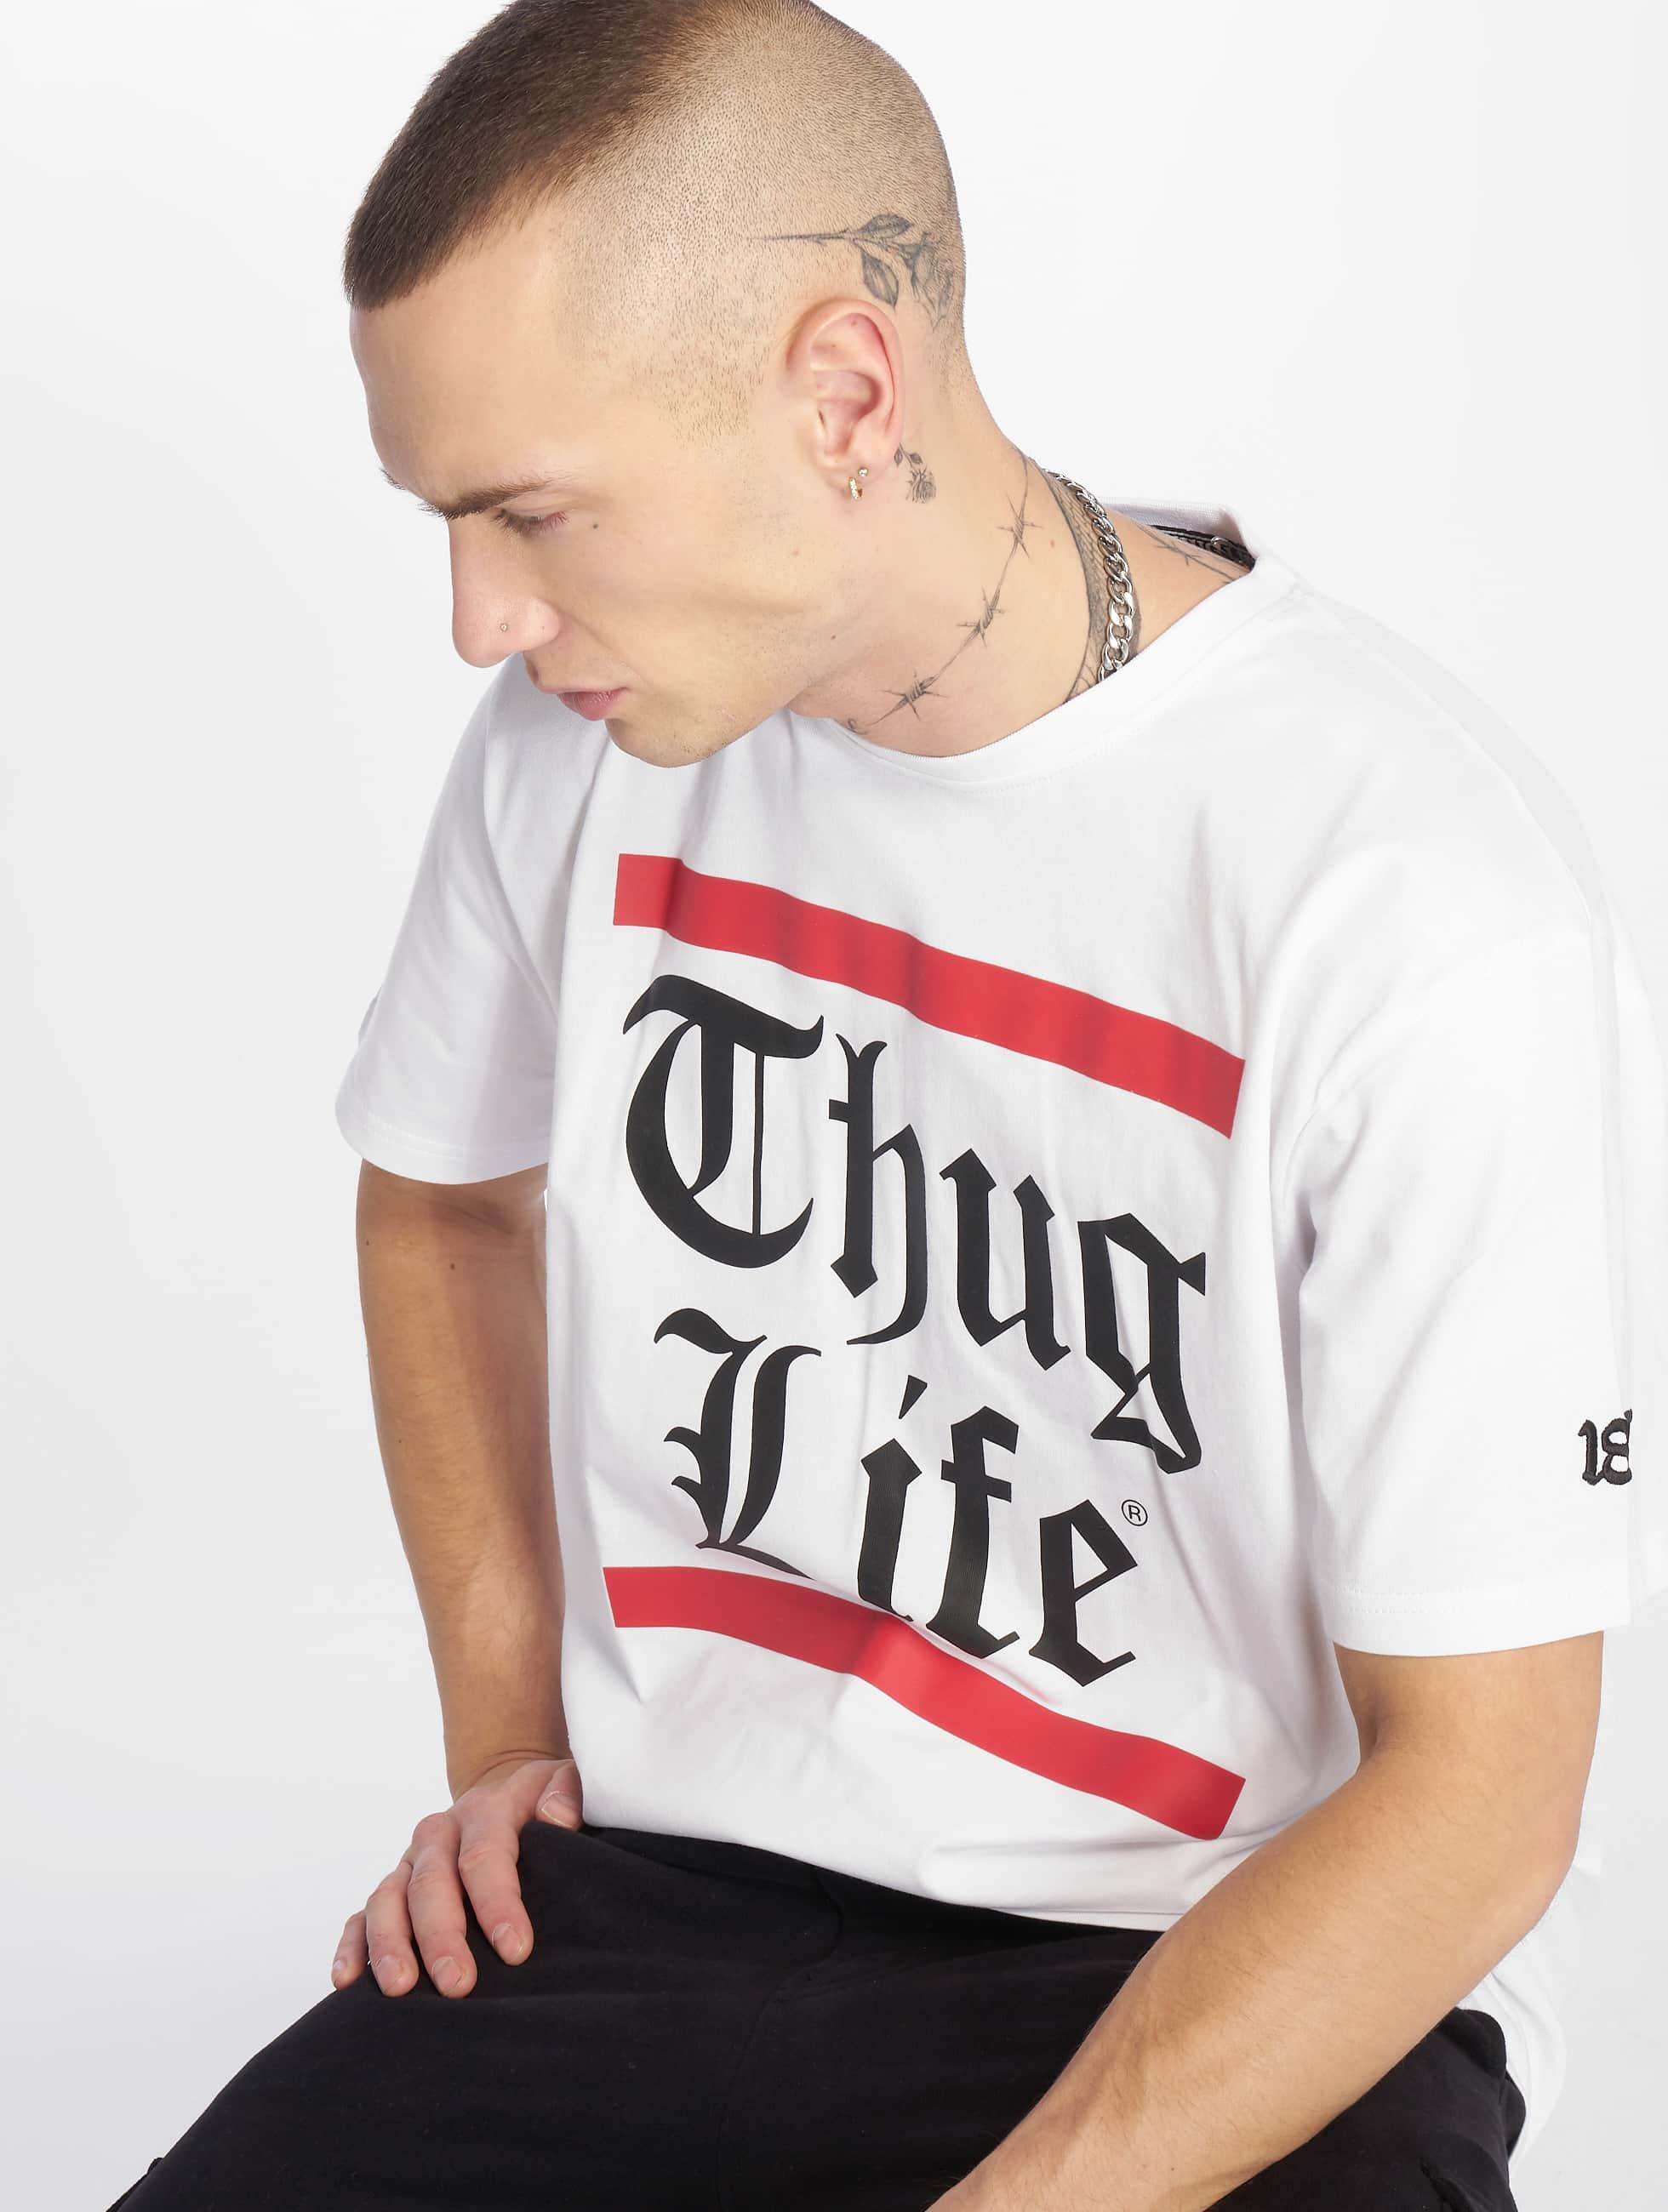 Thug Life / T-Shirt B.Gothic in white XL